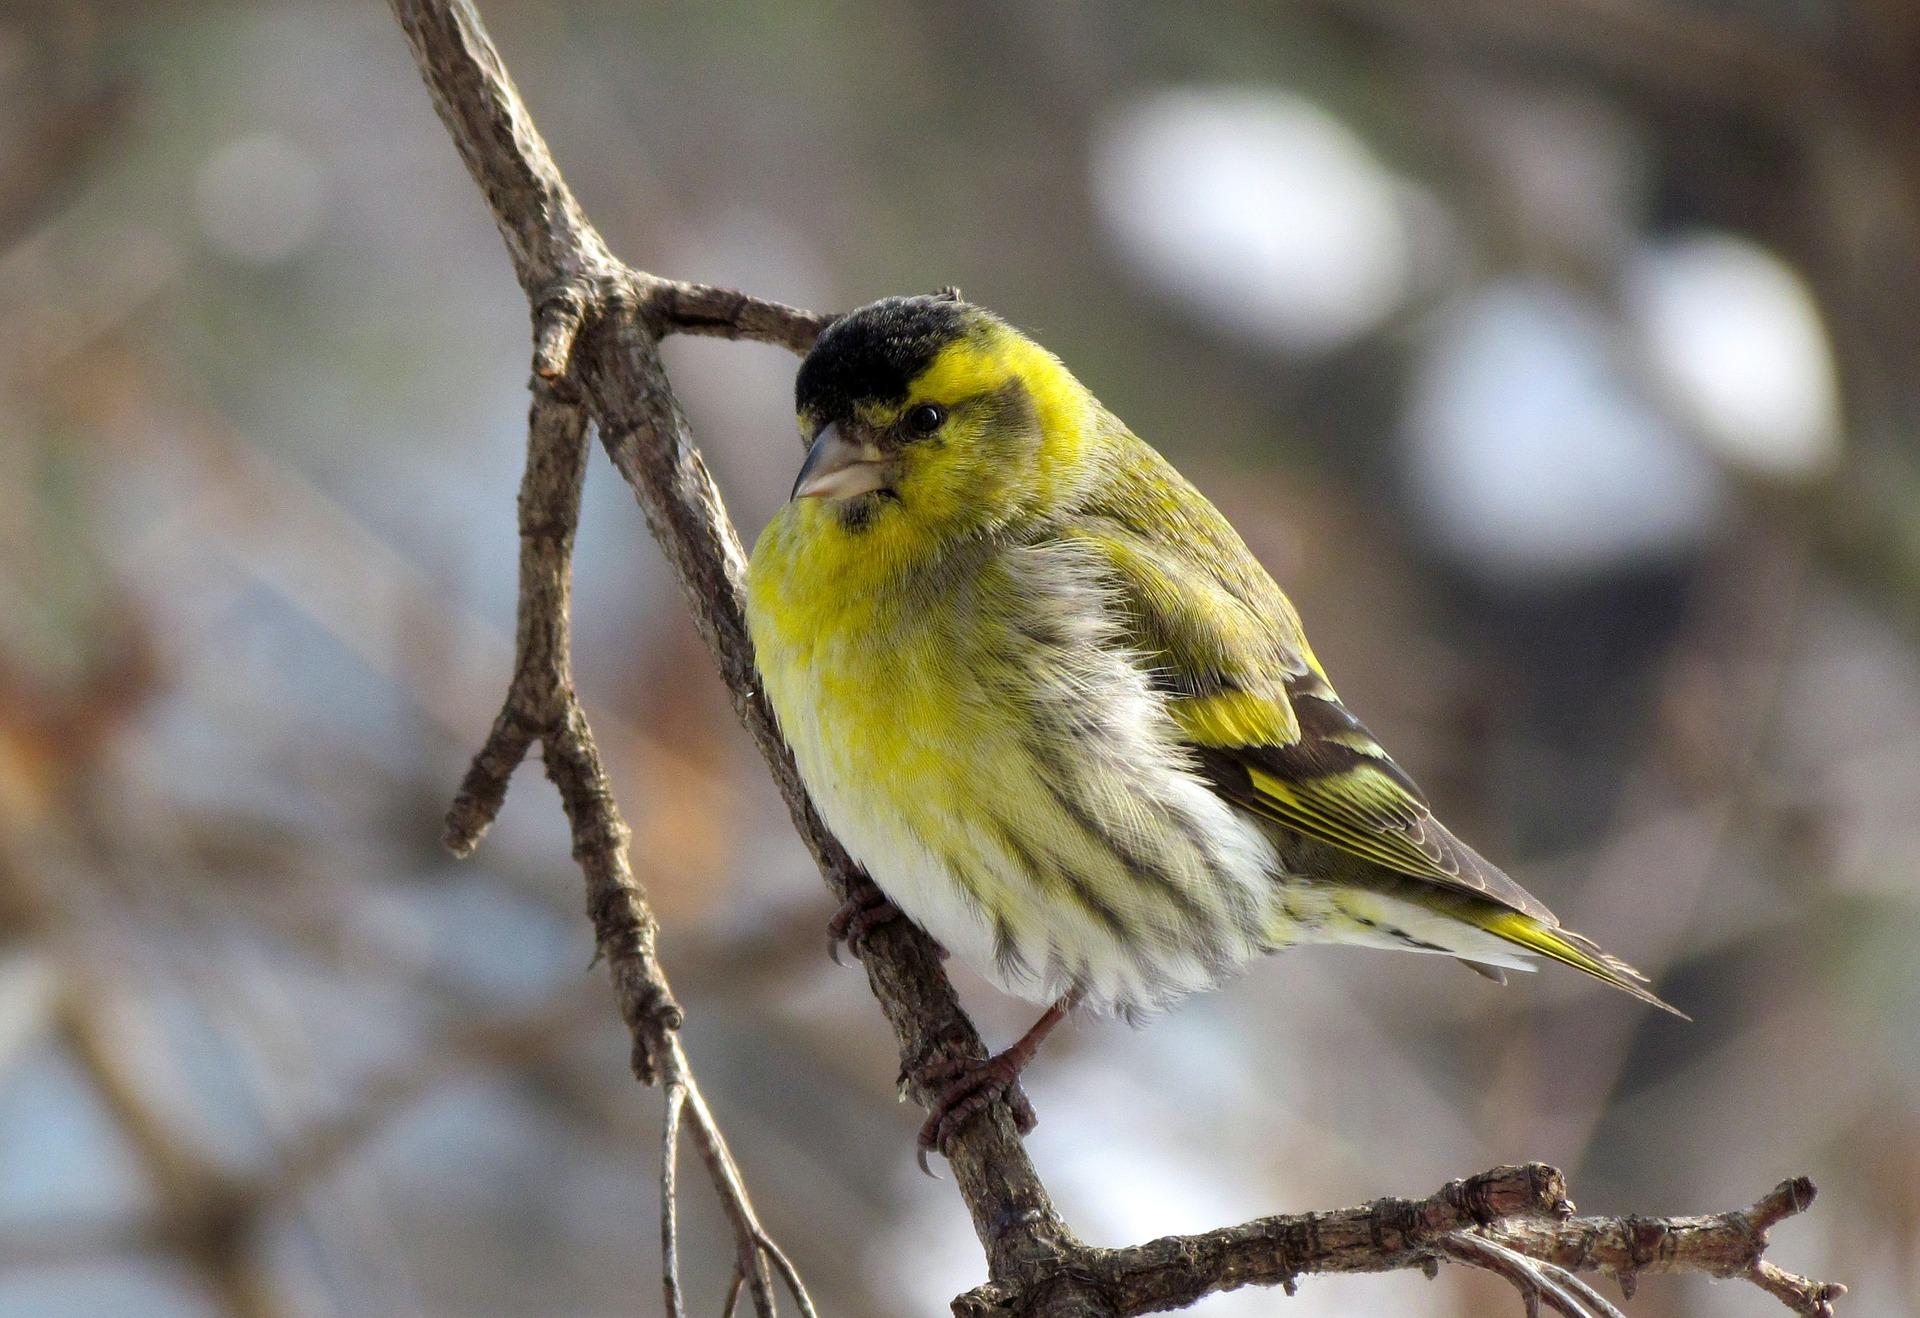 bird-1160460_1920.jpg